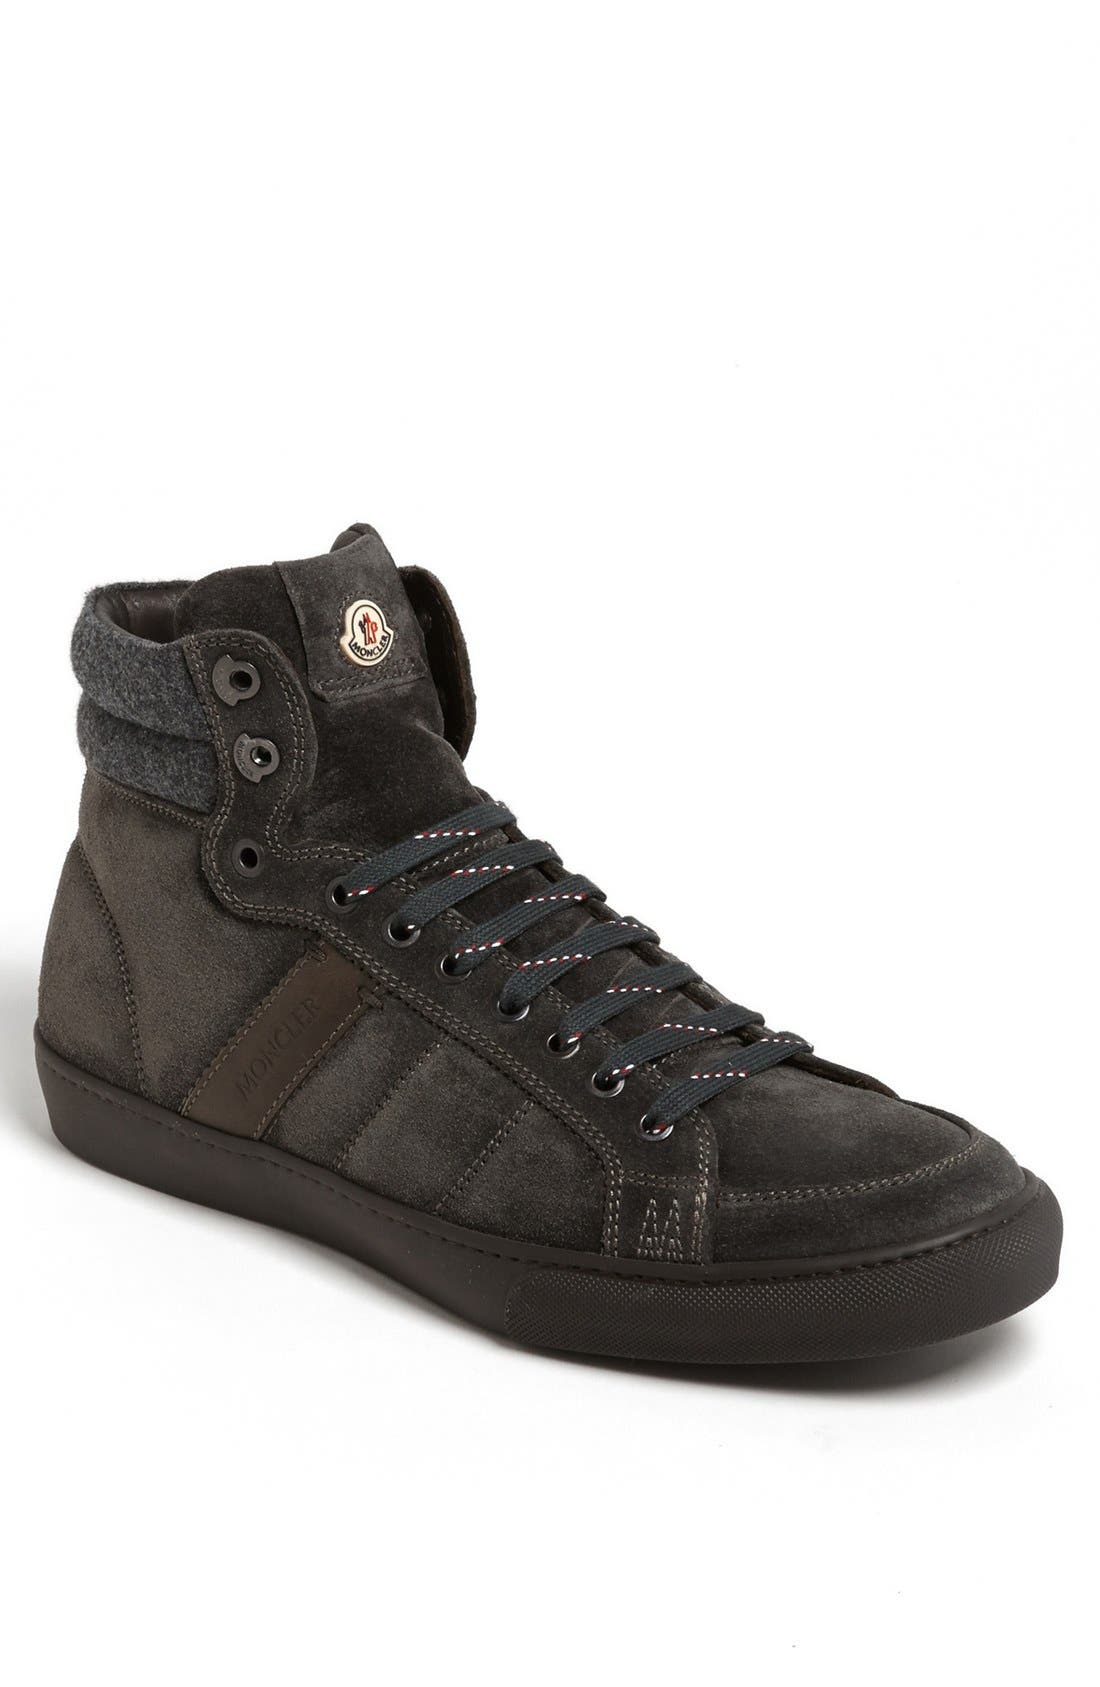 Main Image - Moncler 'Lyon' Suede Sneaker